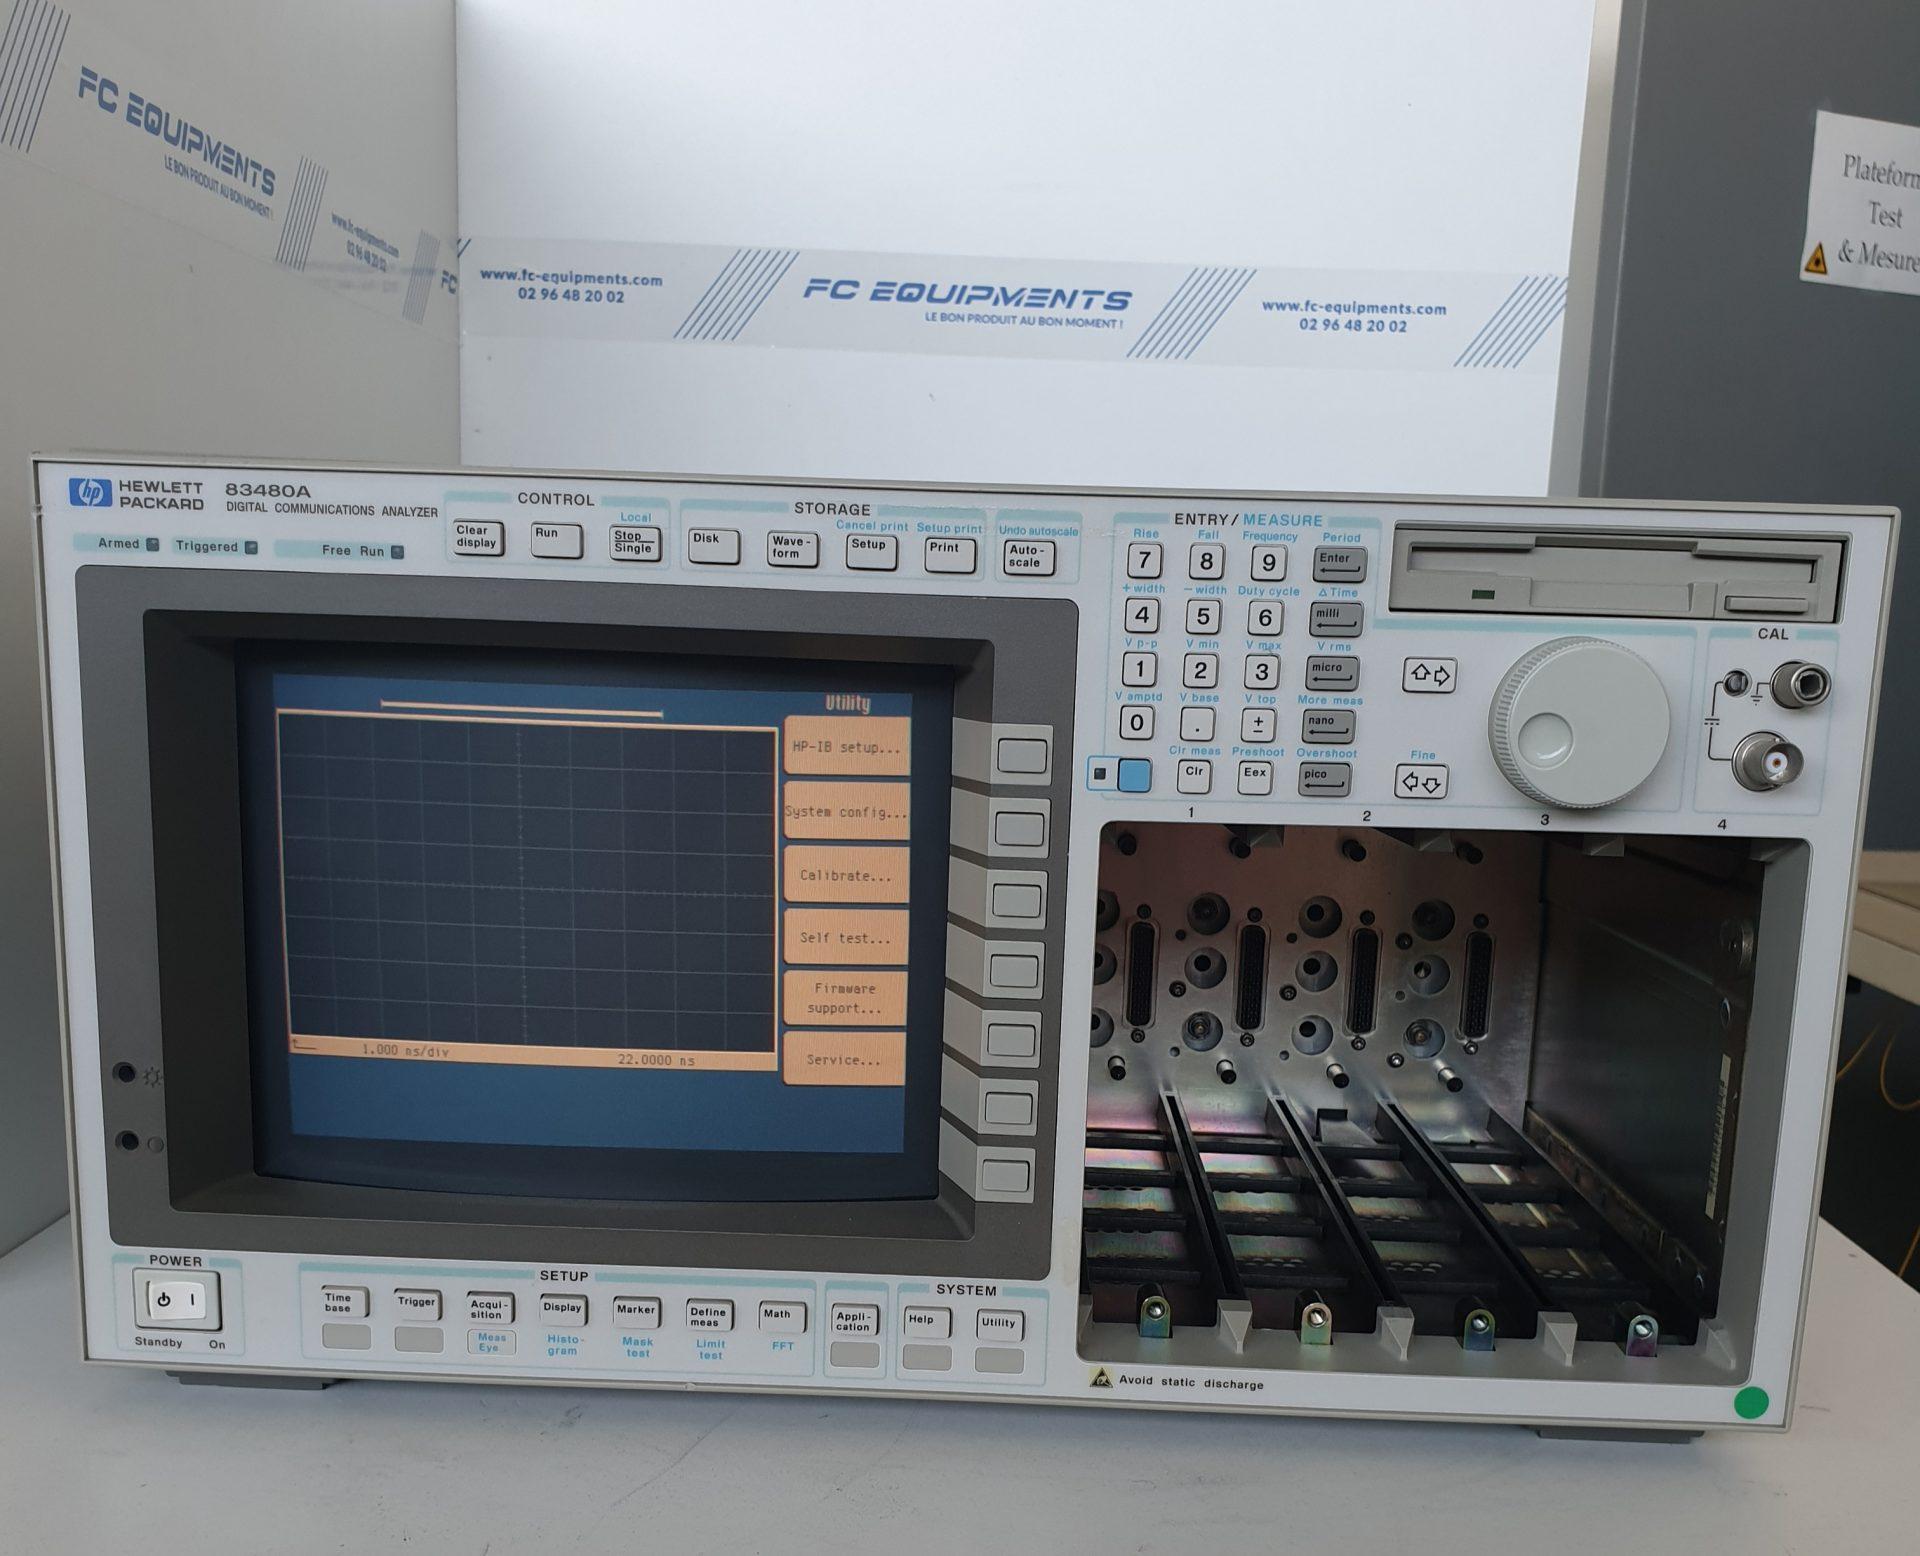 DIGITAL COMMUNICATION ANALYZER PLATFORM - KEYSIGHT TECHNOLOGIES (AGILENT/HP)